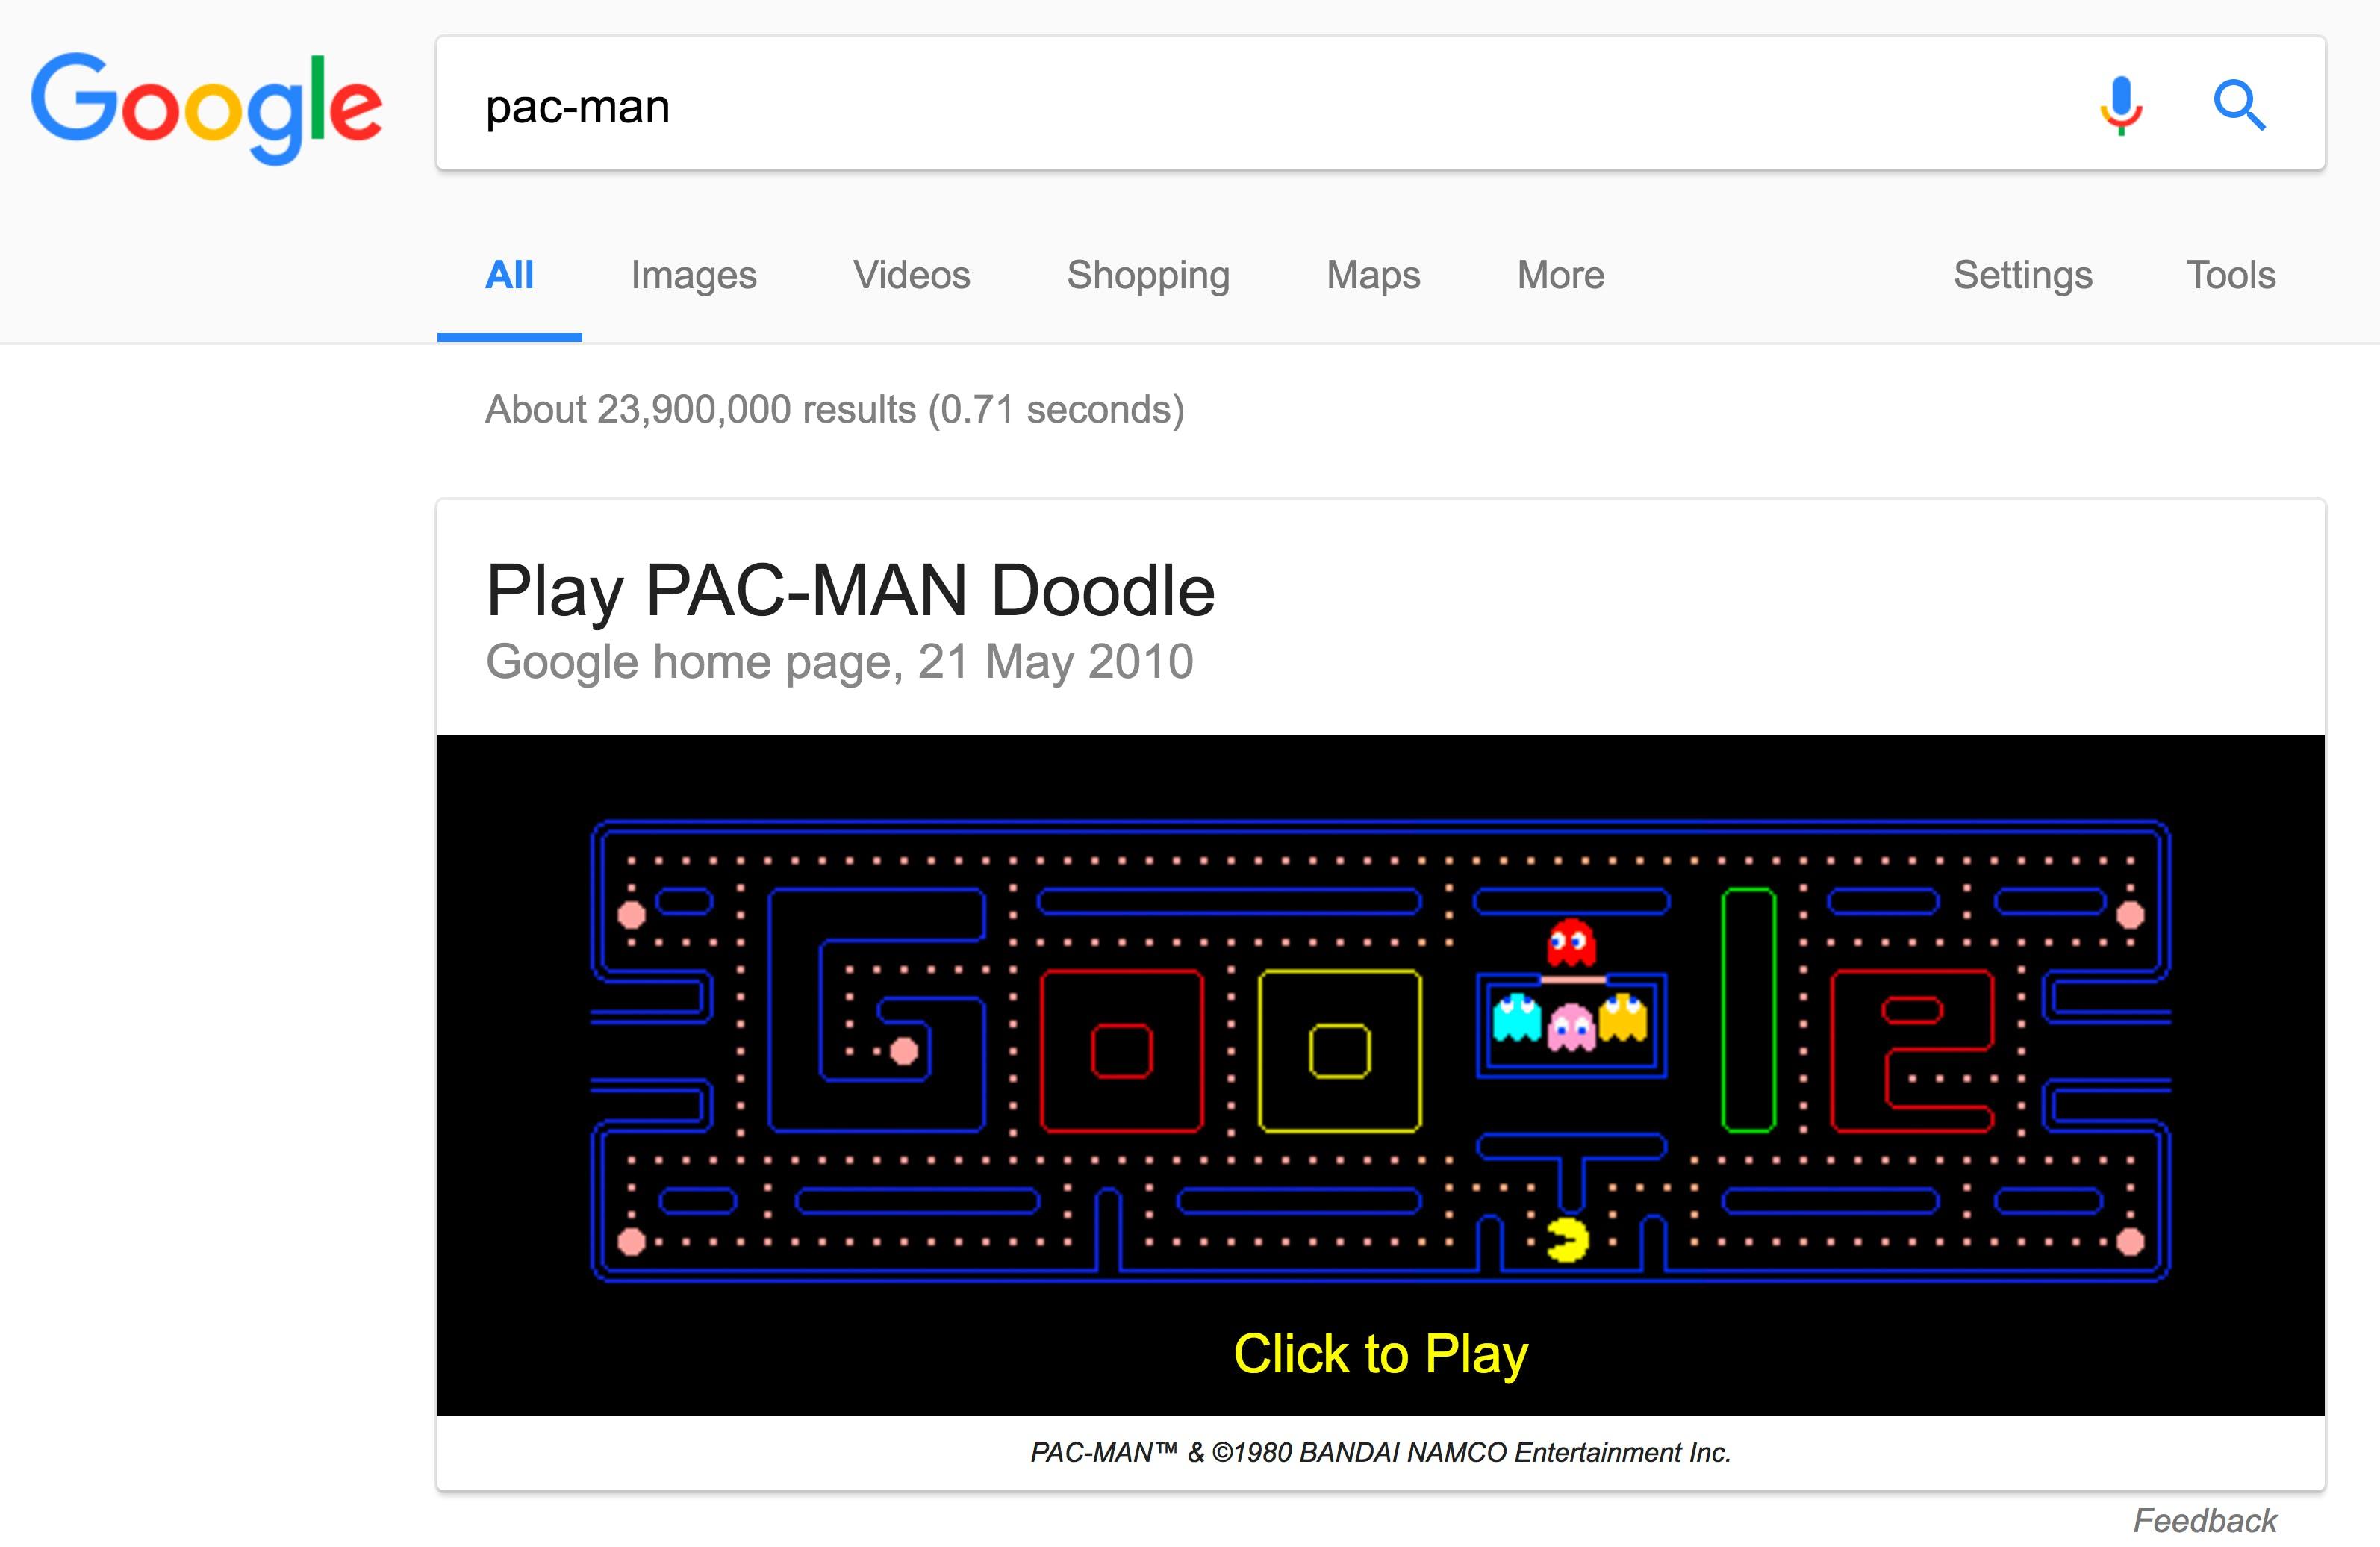 Pac-man in Google